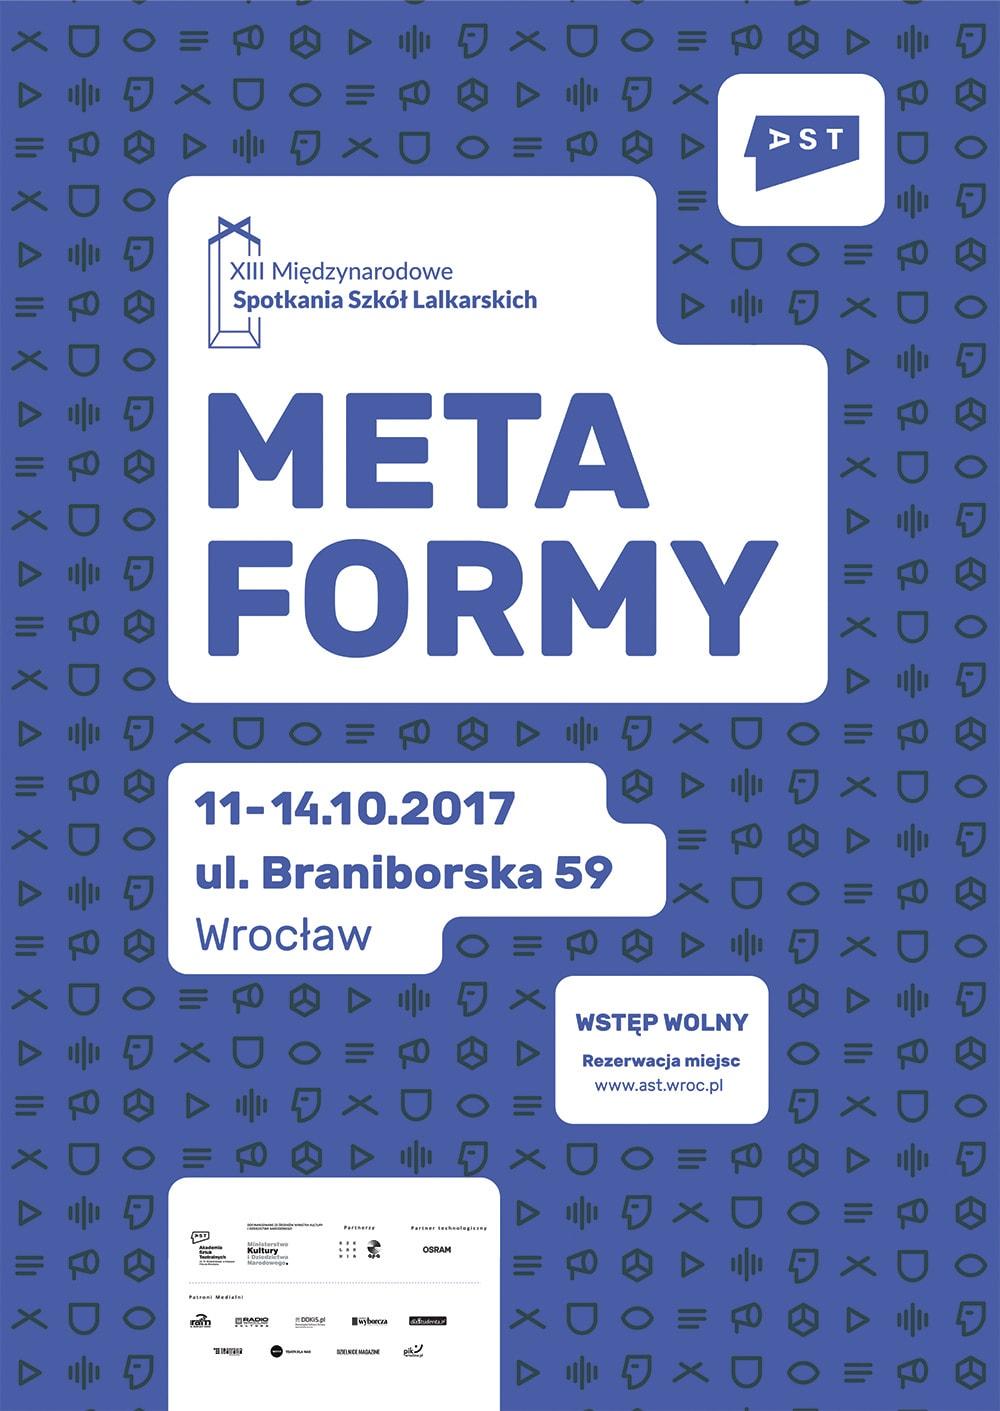 Metaformy 2017